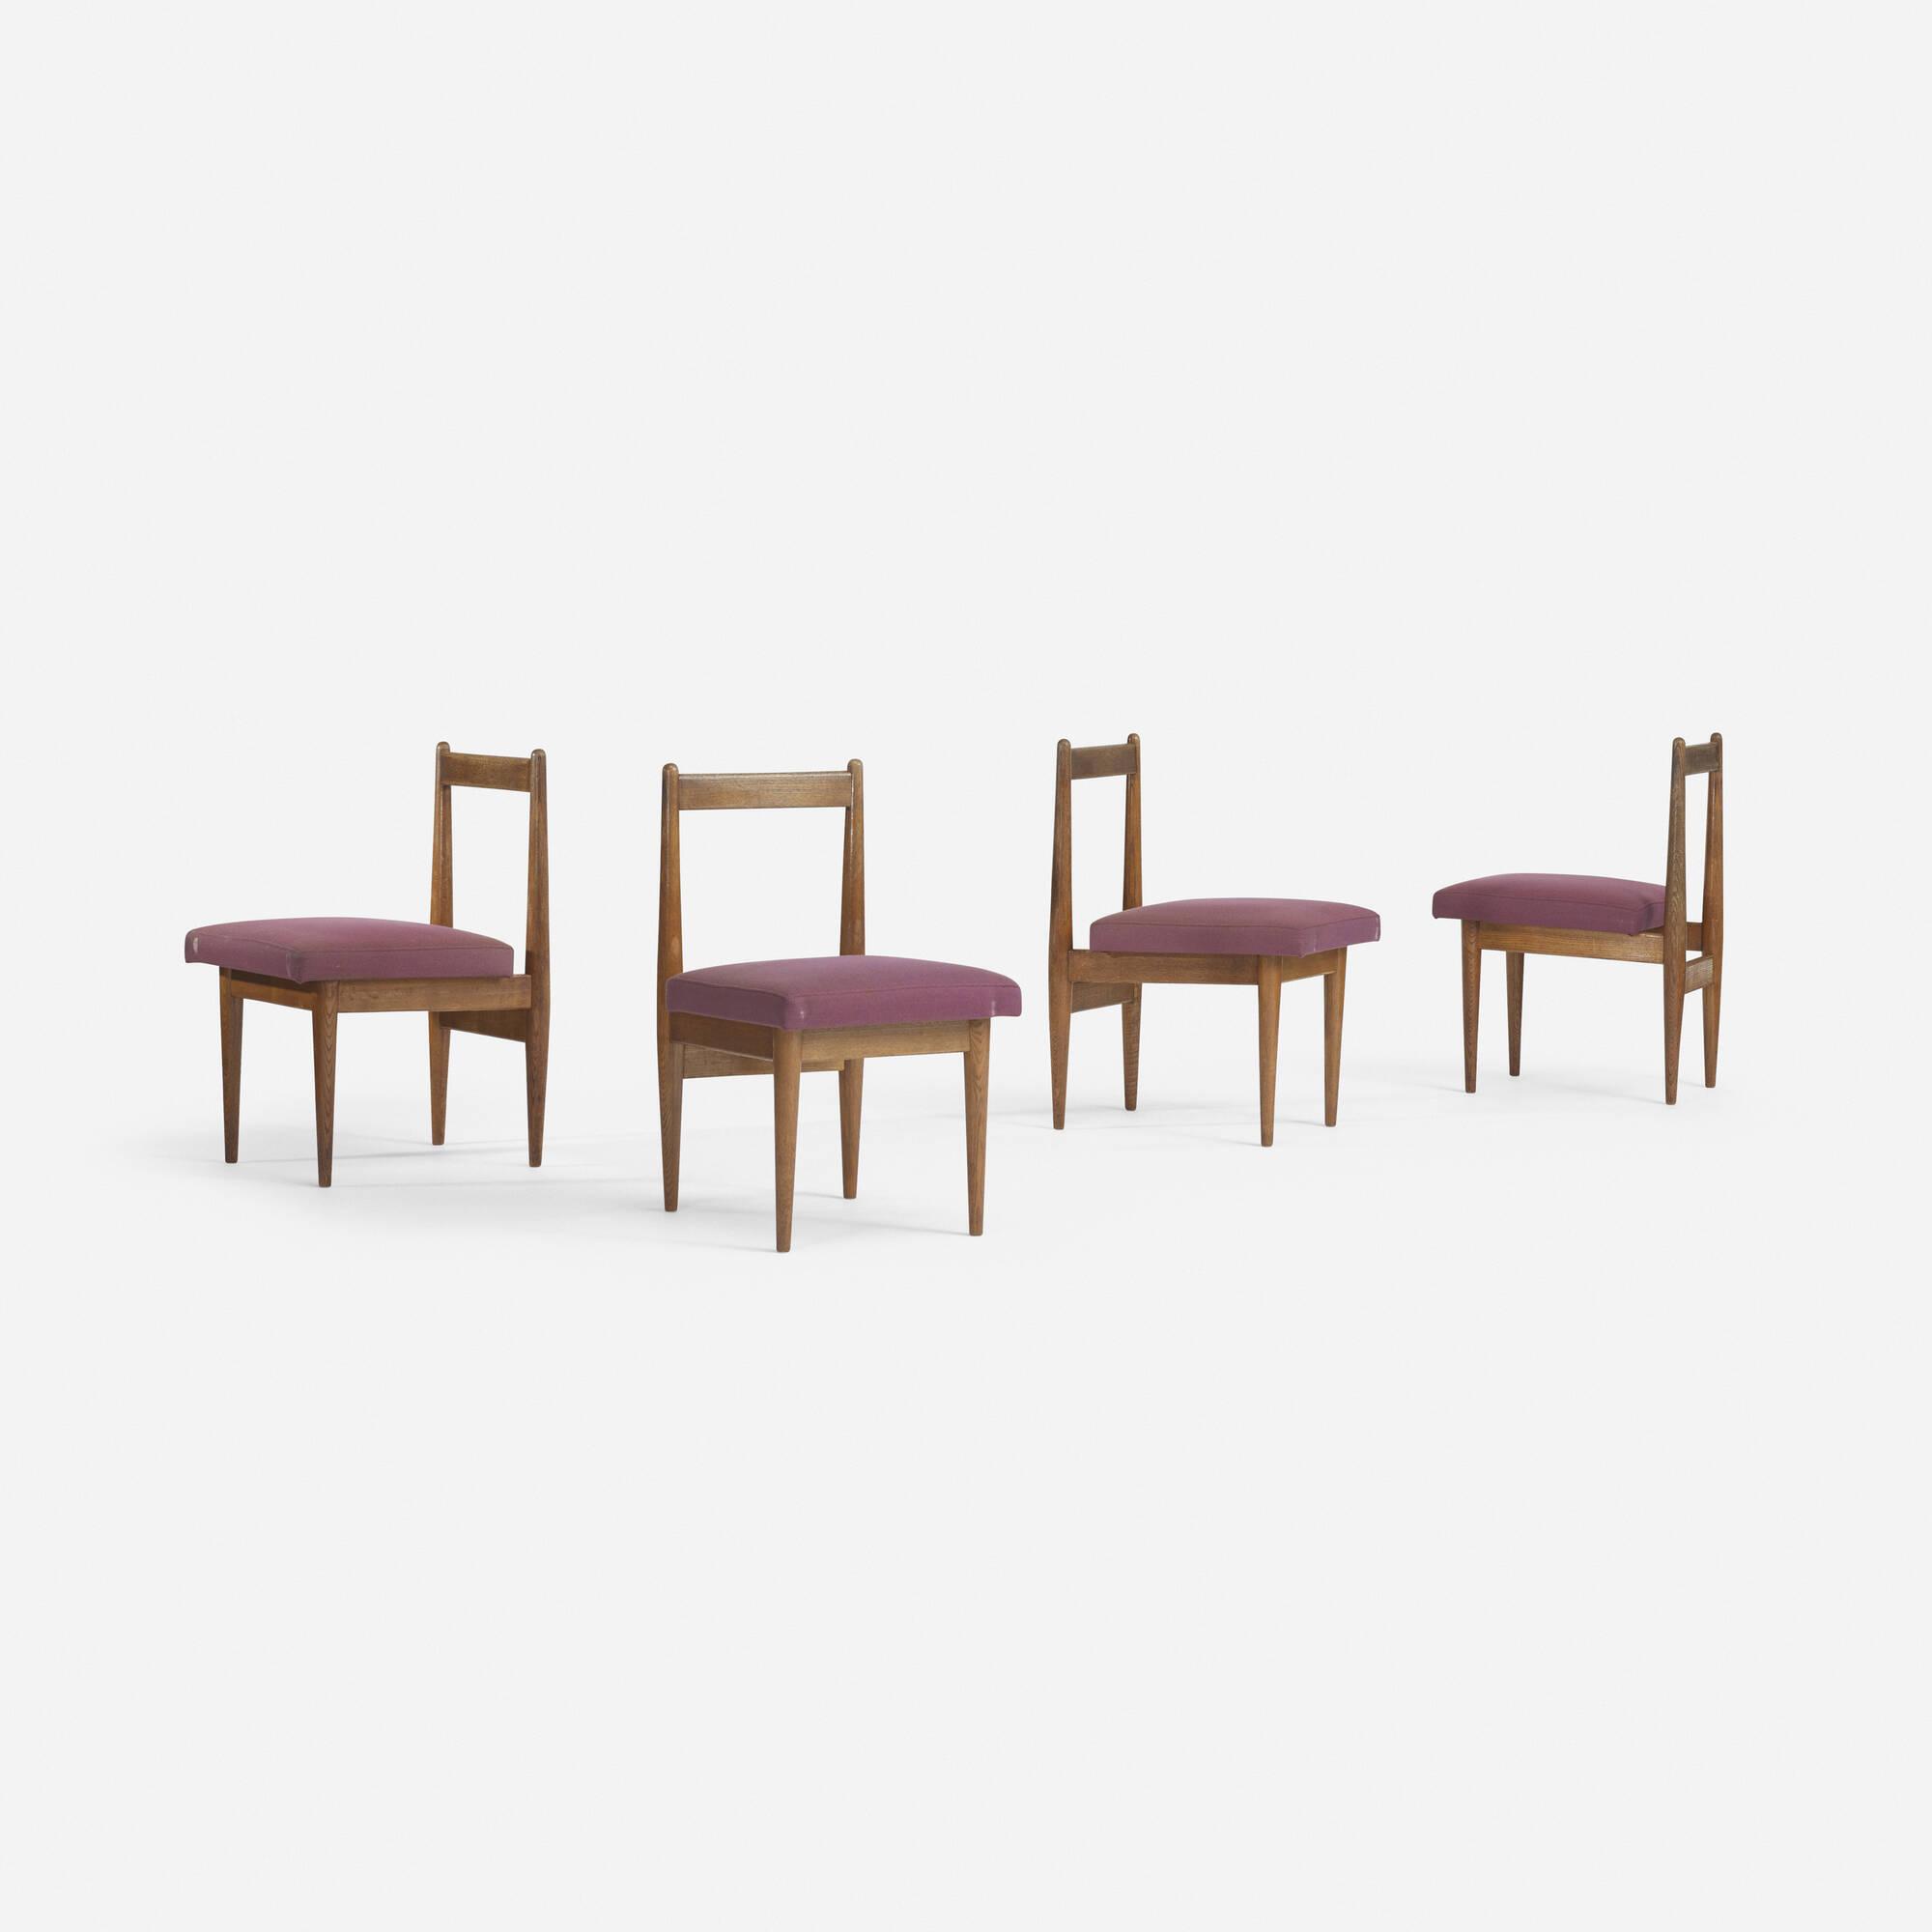 544: Katsuo Matsumura / dining chairs, set of four (1 of 2)